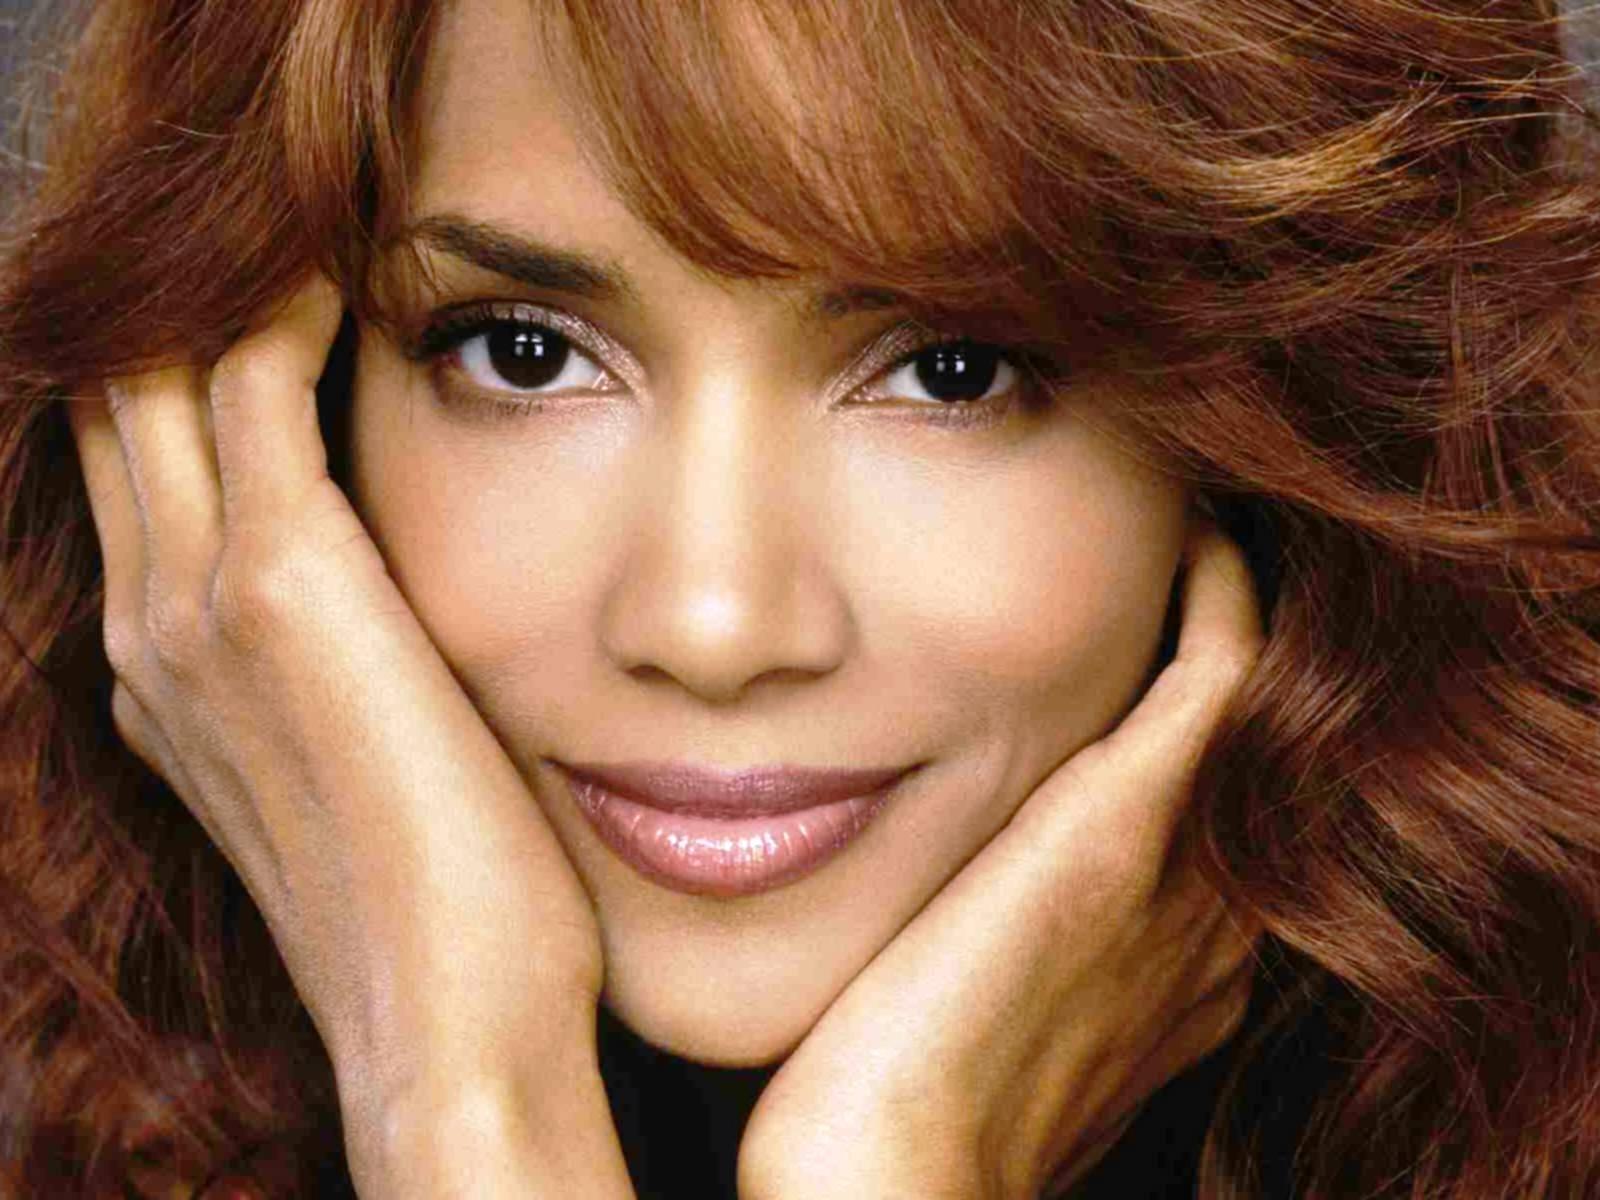 beautiful female celebrities wallpapers - photo #1